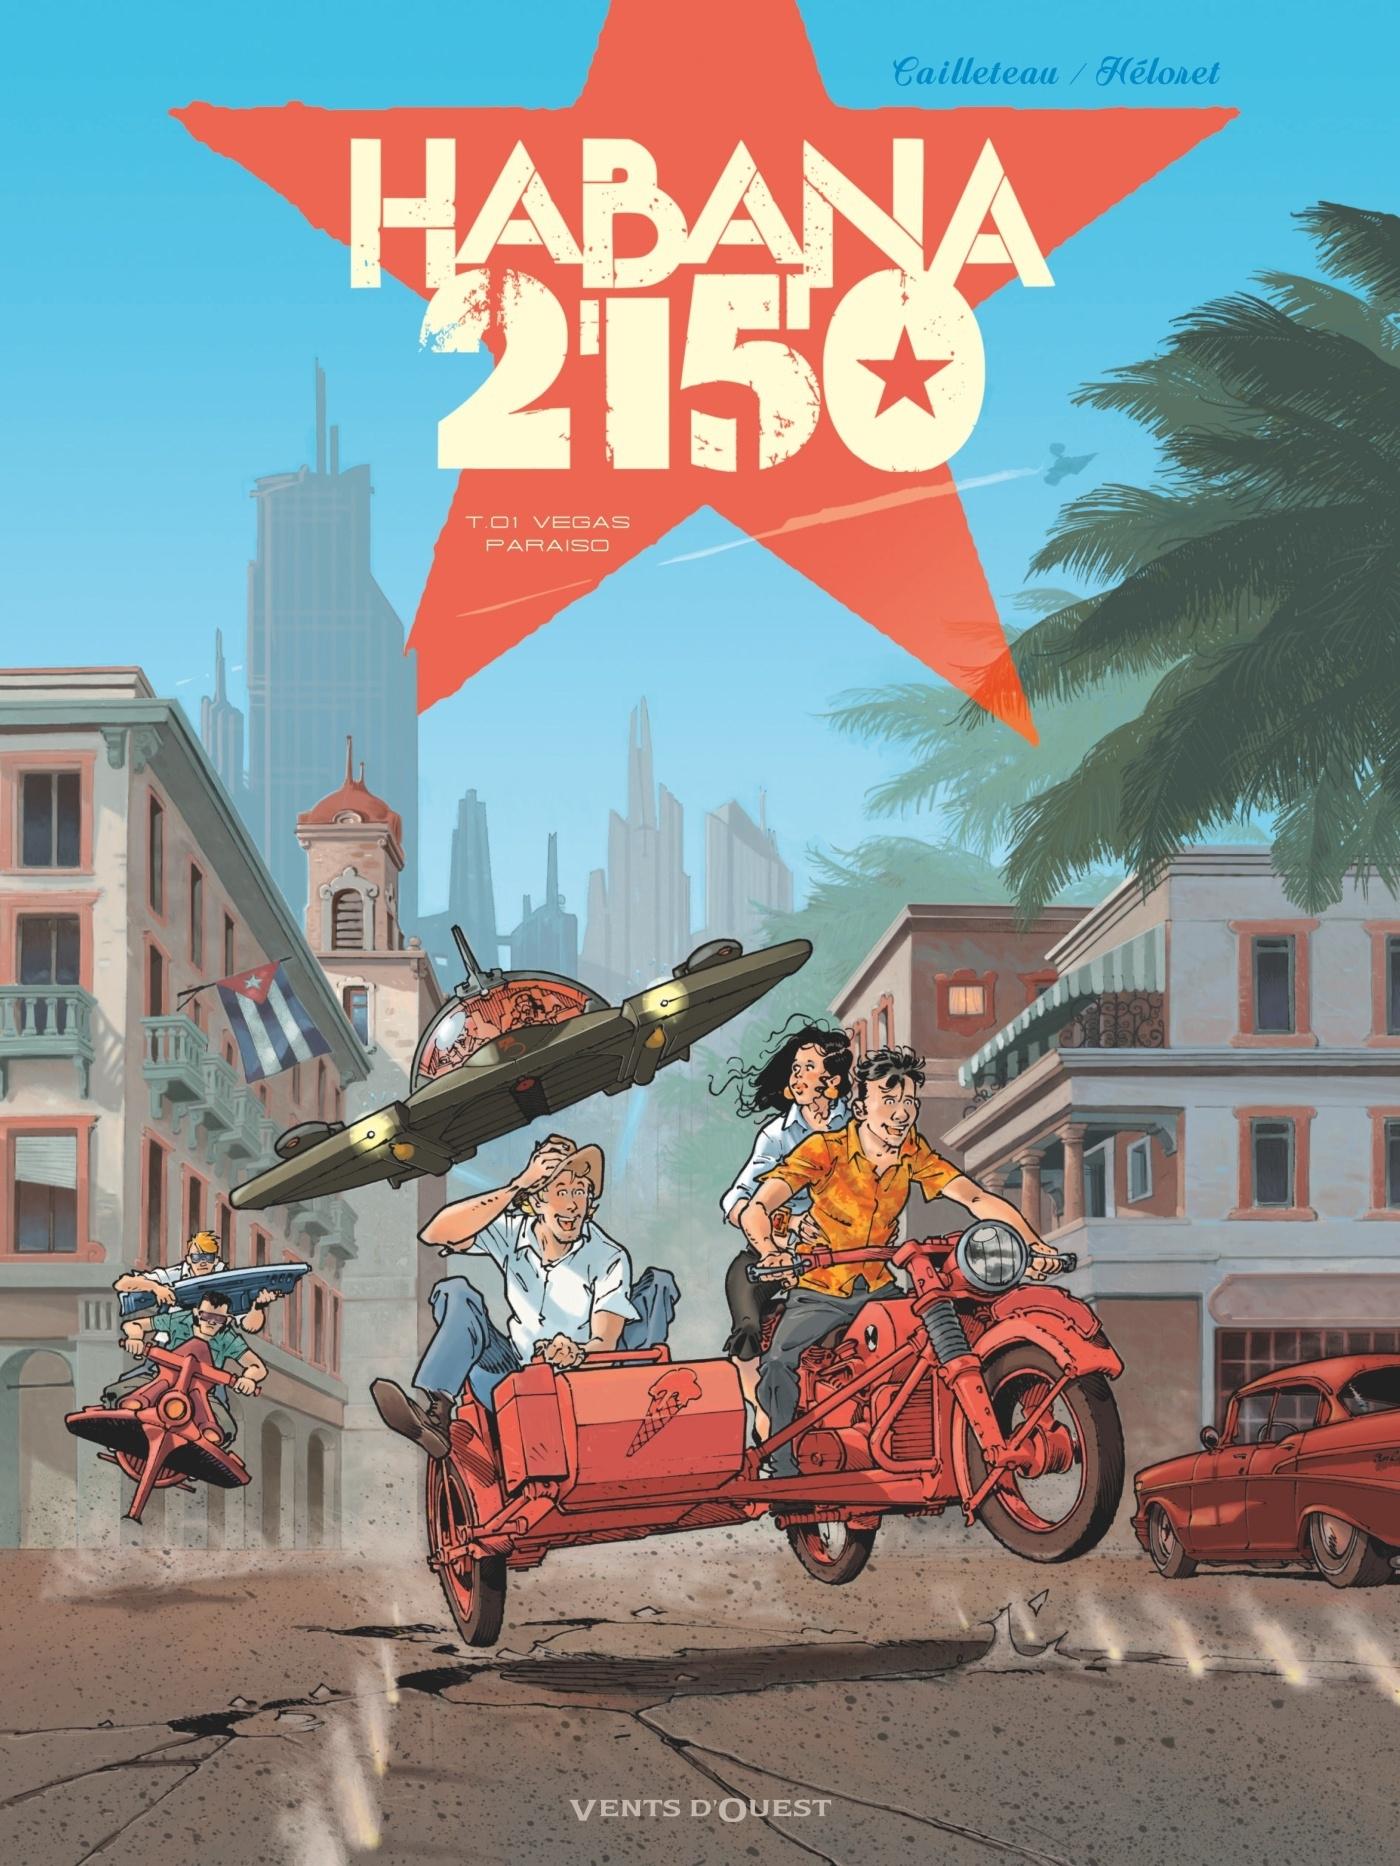 HABANA 2150 - TOME 01 - VEGAS PARAISO